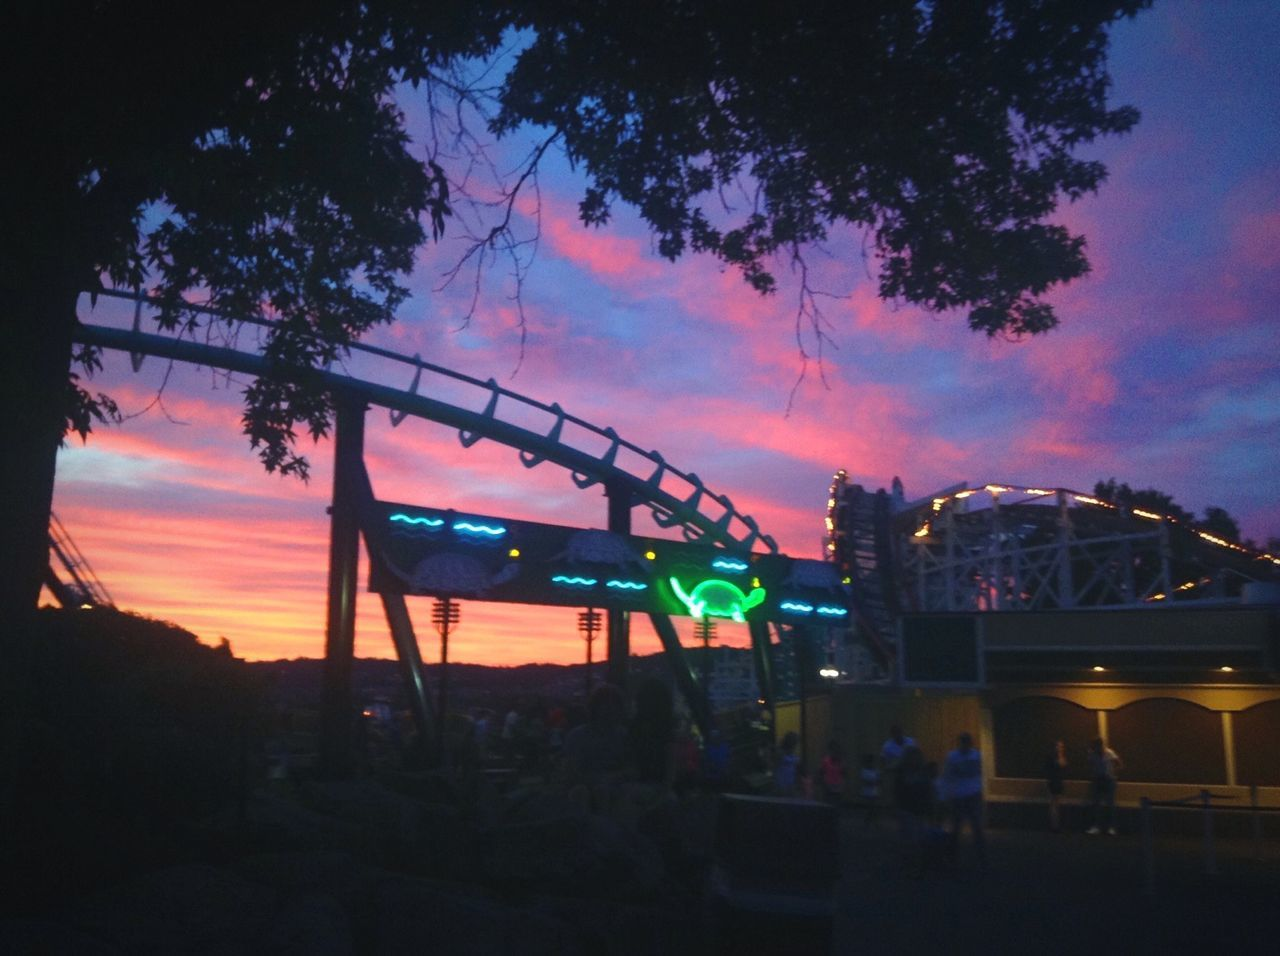 🎡🎢 Arts Culture And Entertainment Amusement Park Sunset Outdoors Cloud - Sky Nature Roller Coaster